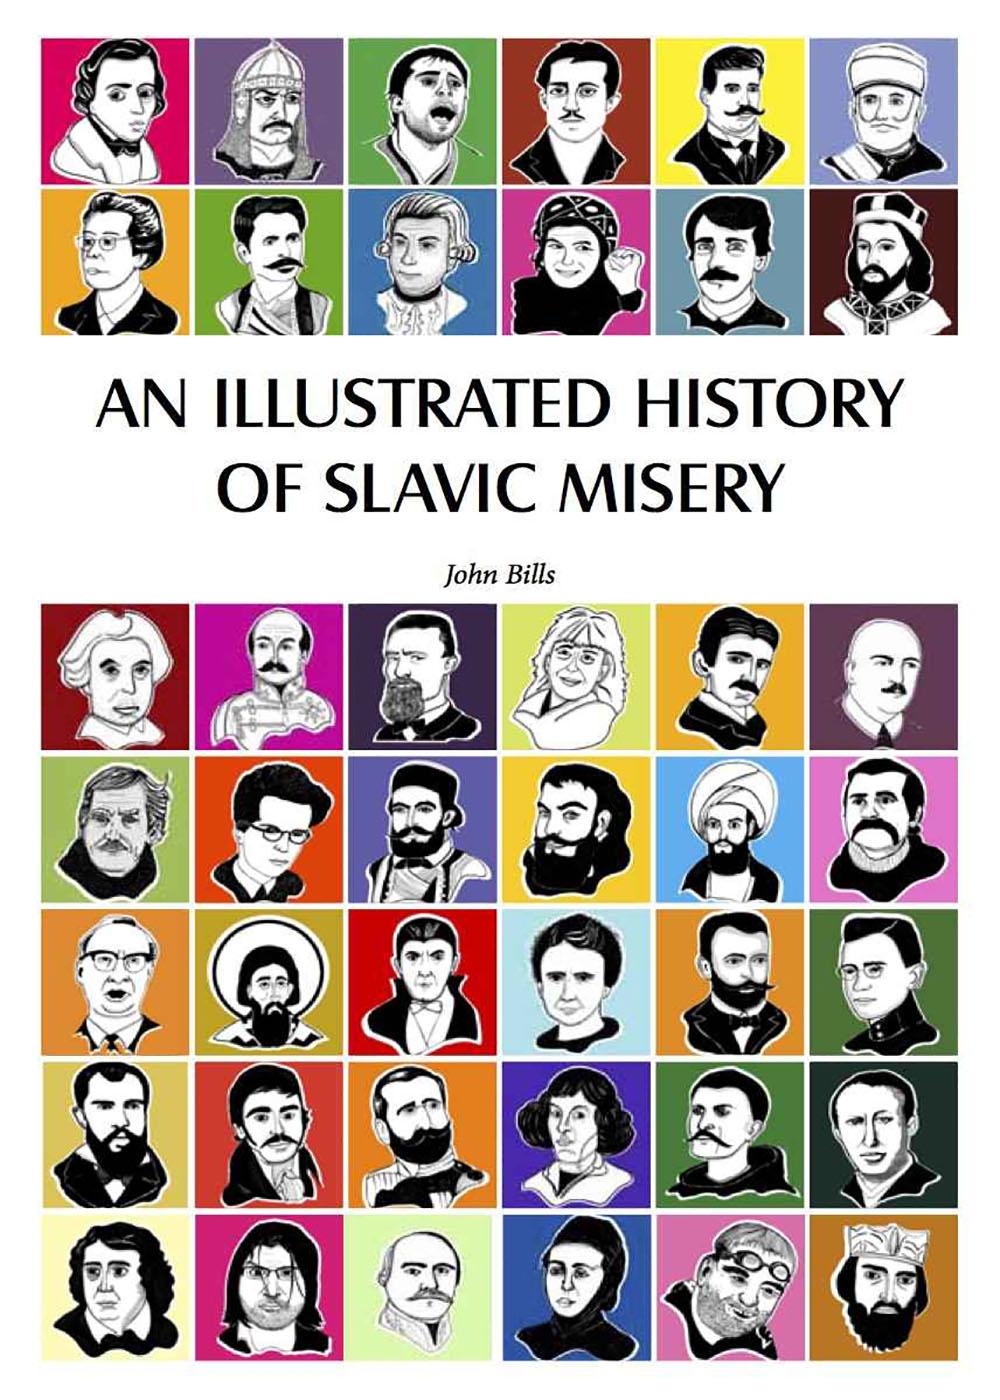 John Bills - An Illustrated History of Slavic Misery